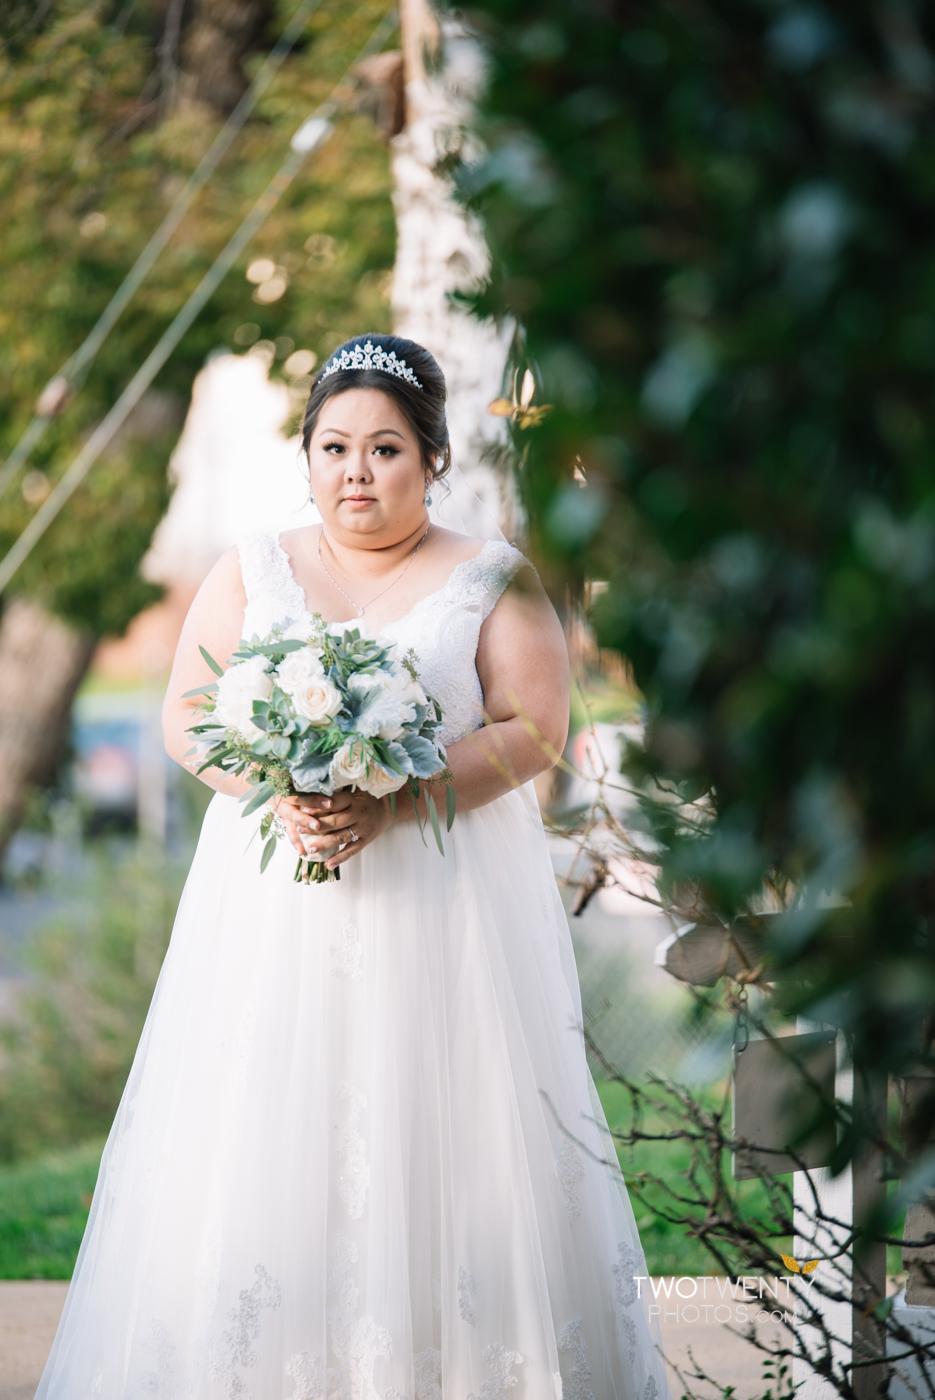 vizcaya-pavilion-sacramento-wedding-photographer-21